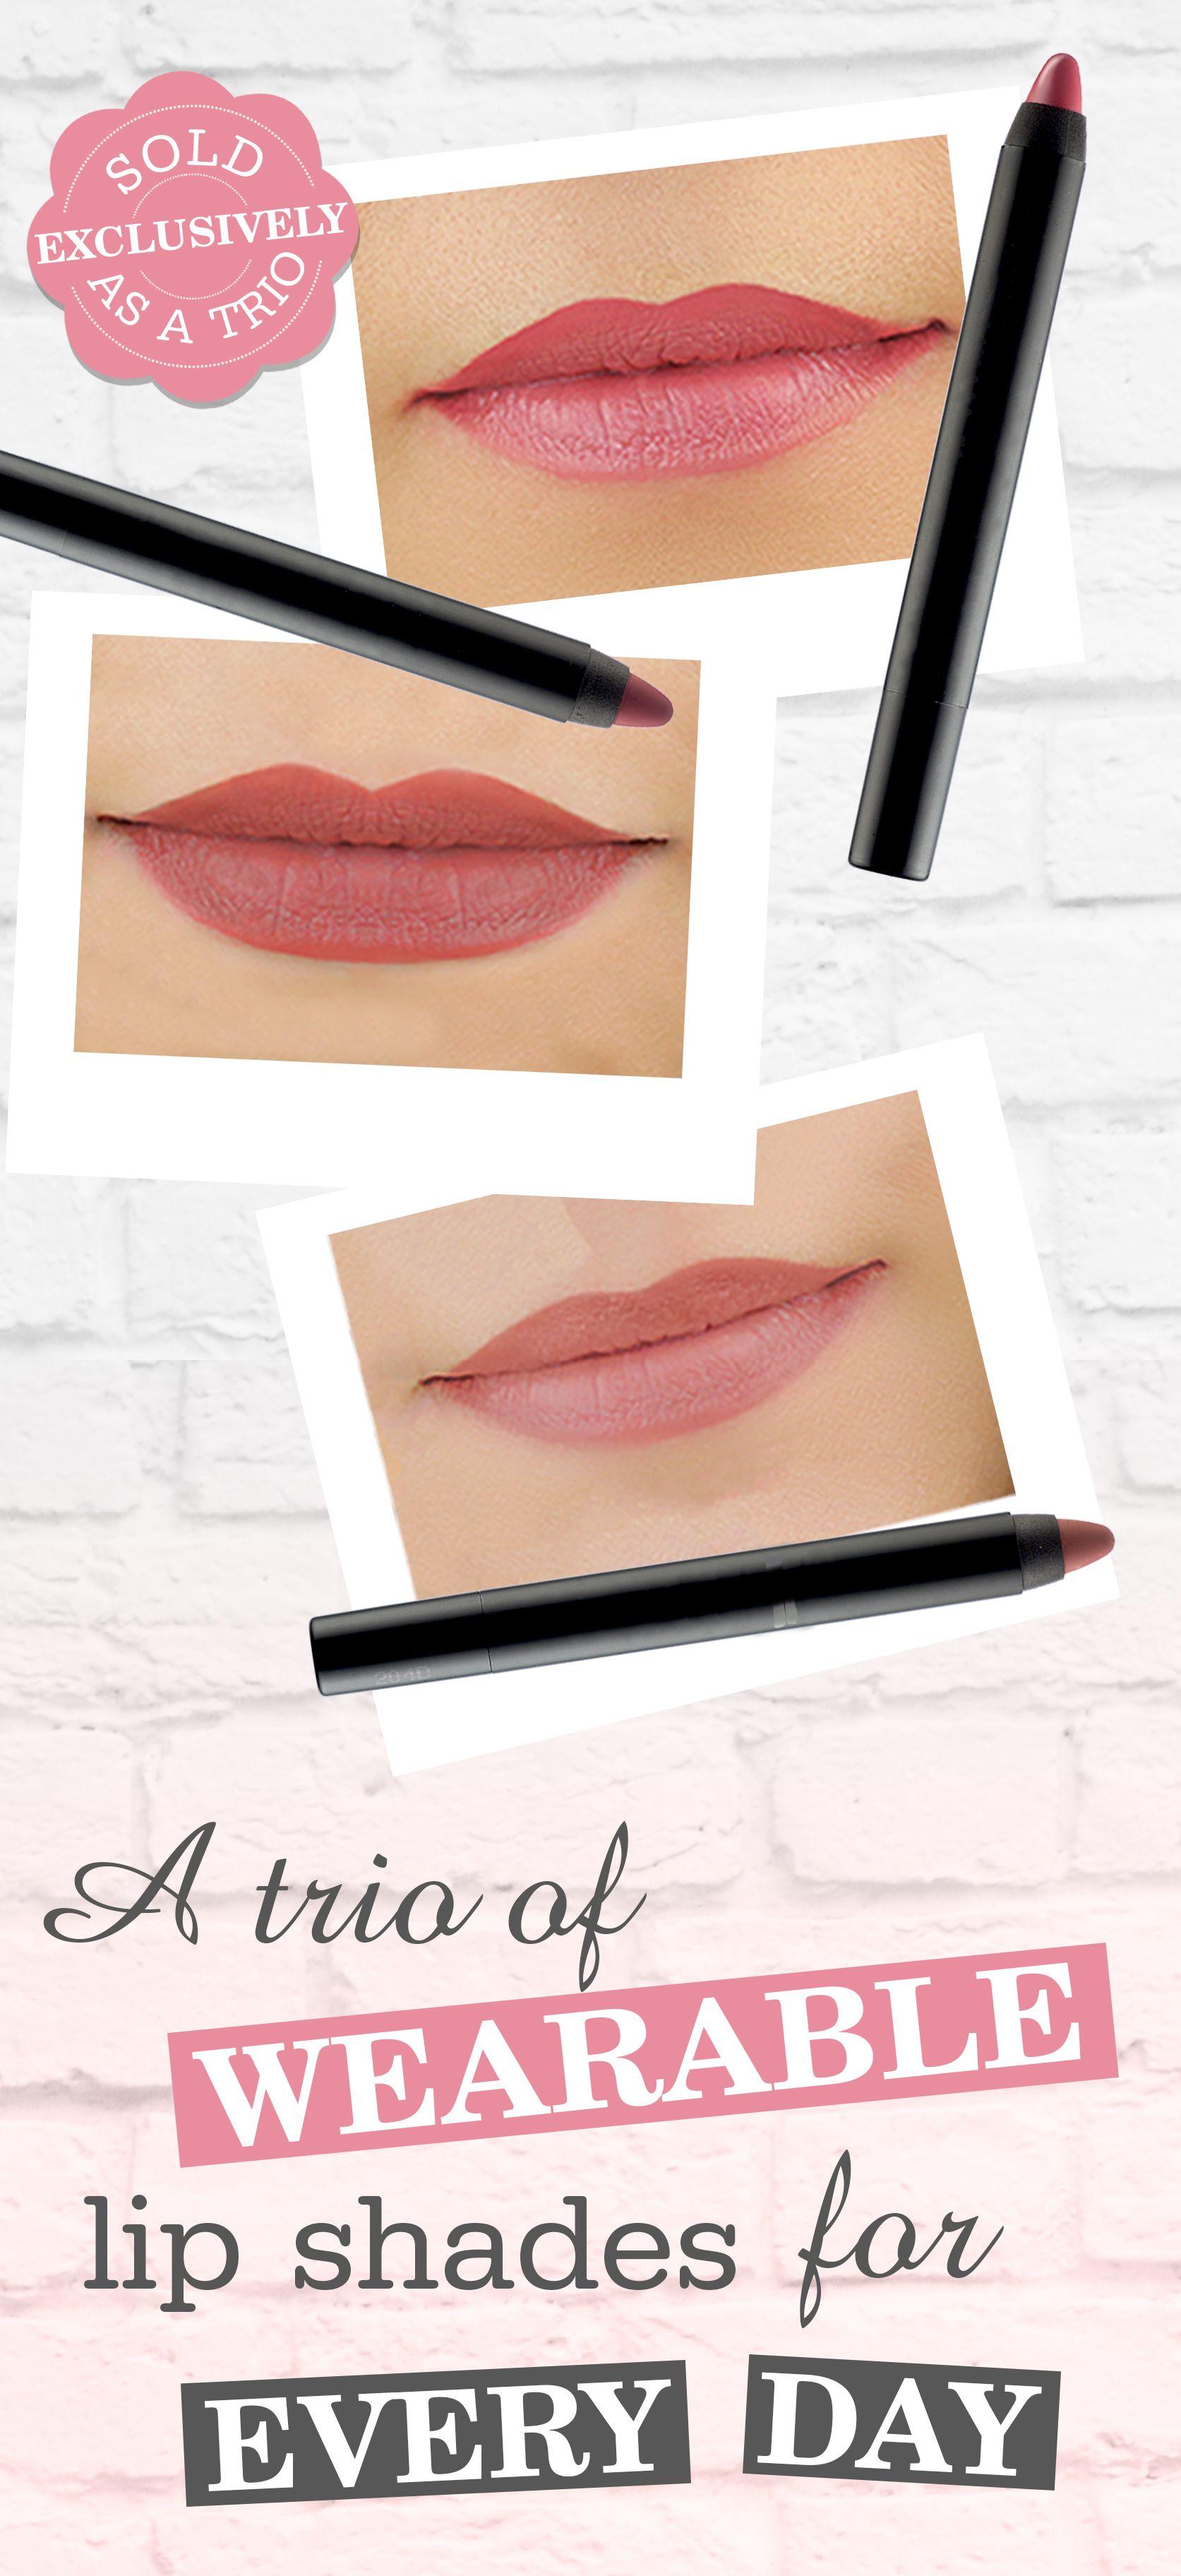 Perfect Curves Lip Crayon - Buy Chubby Matte Pink Lipstick